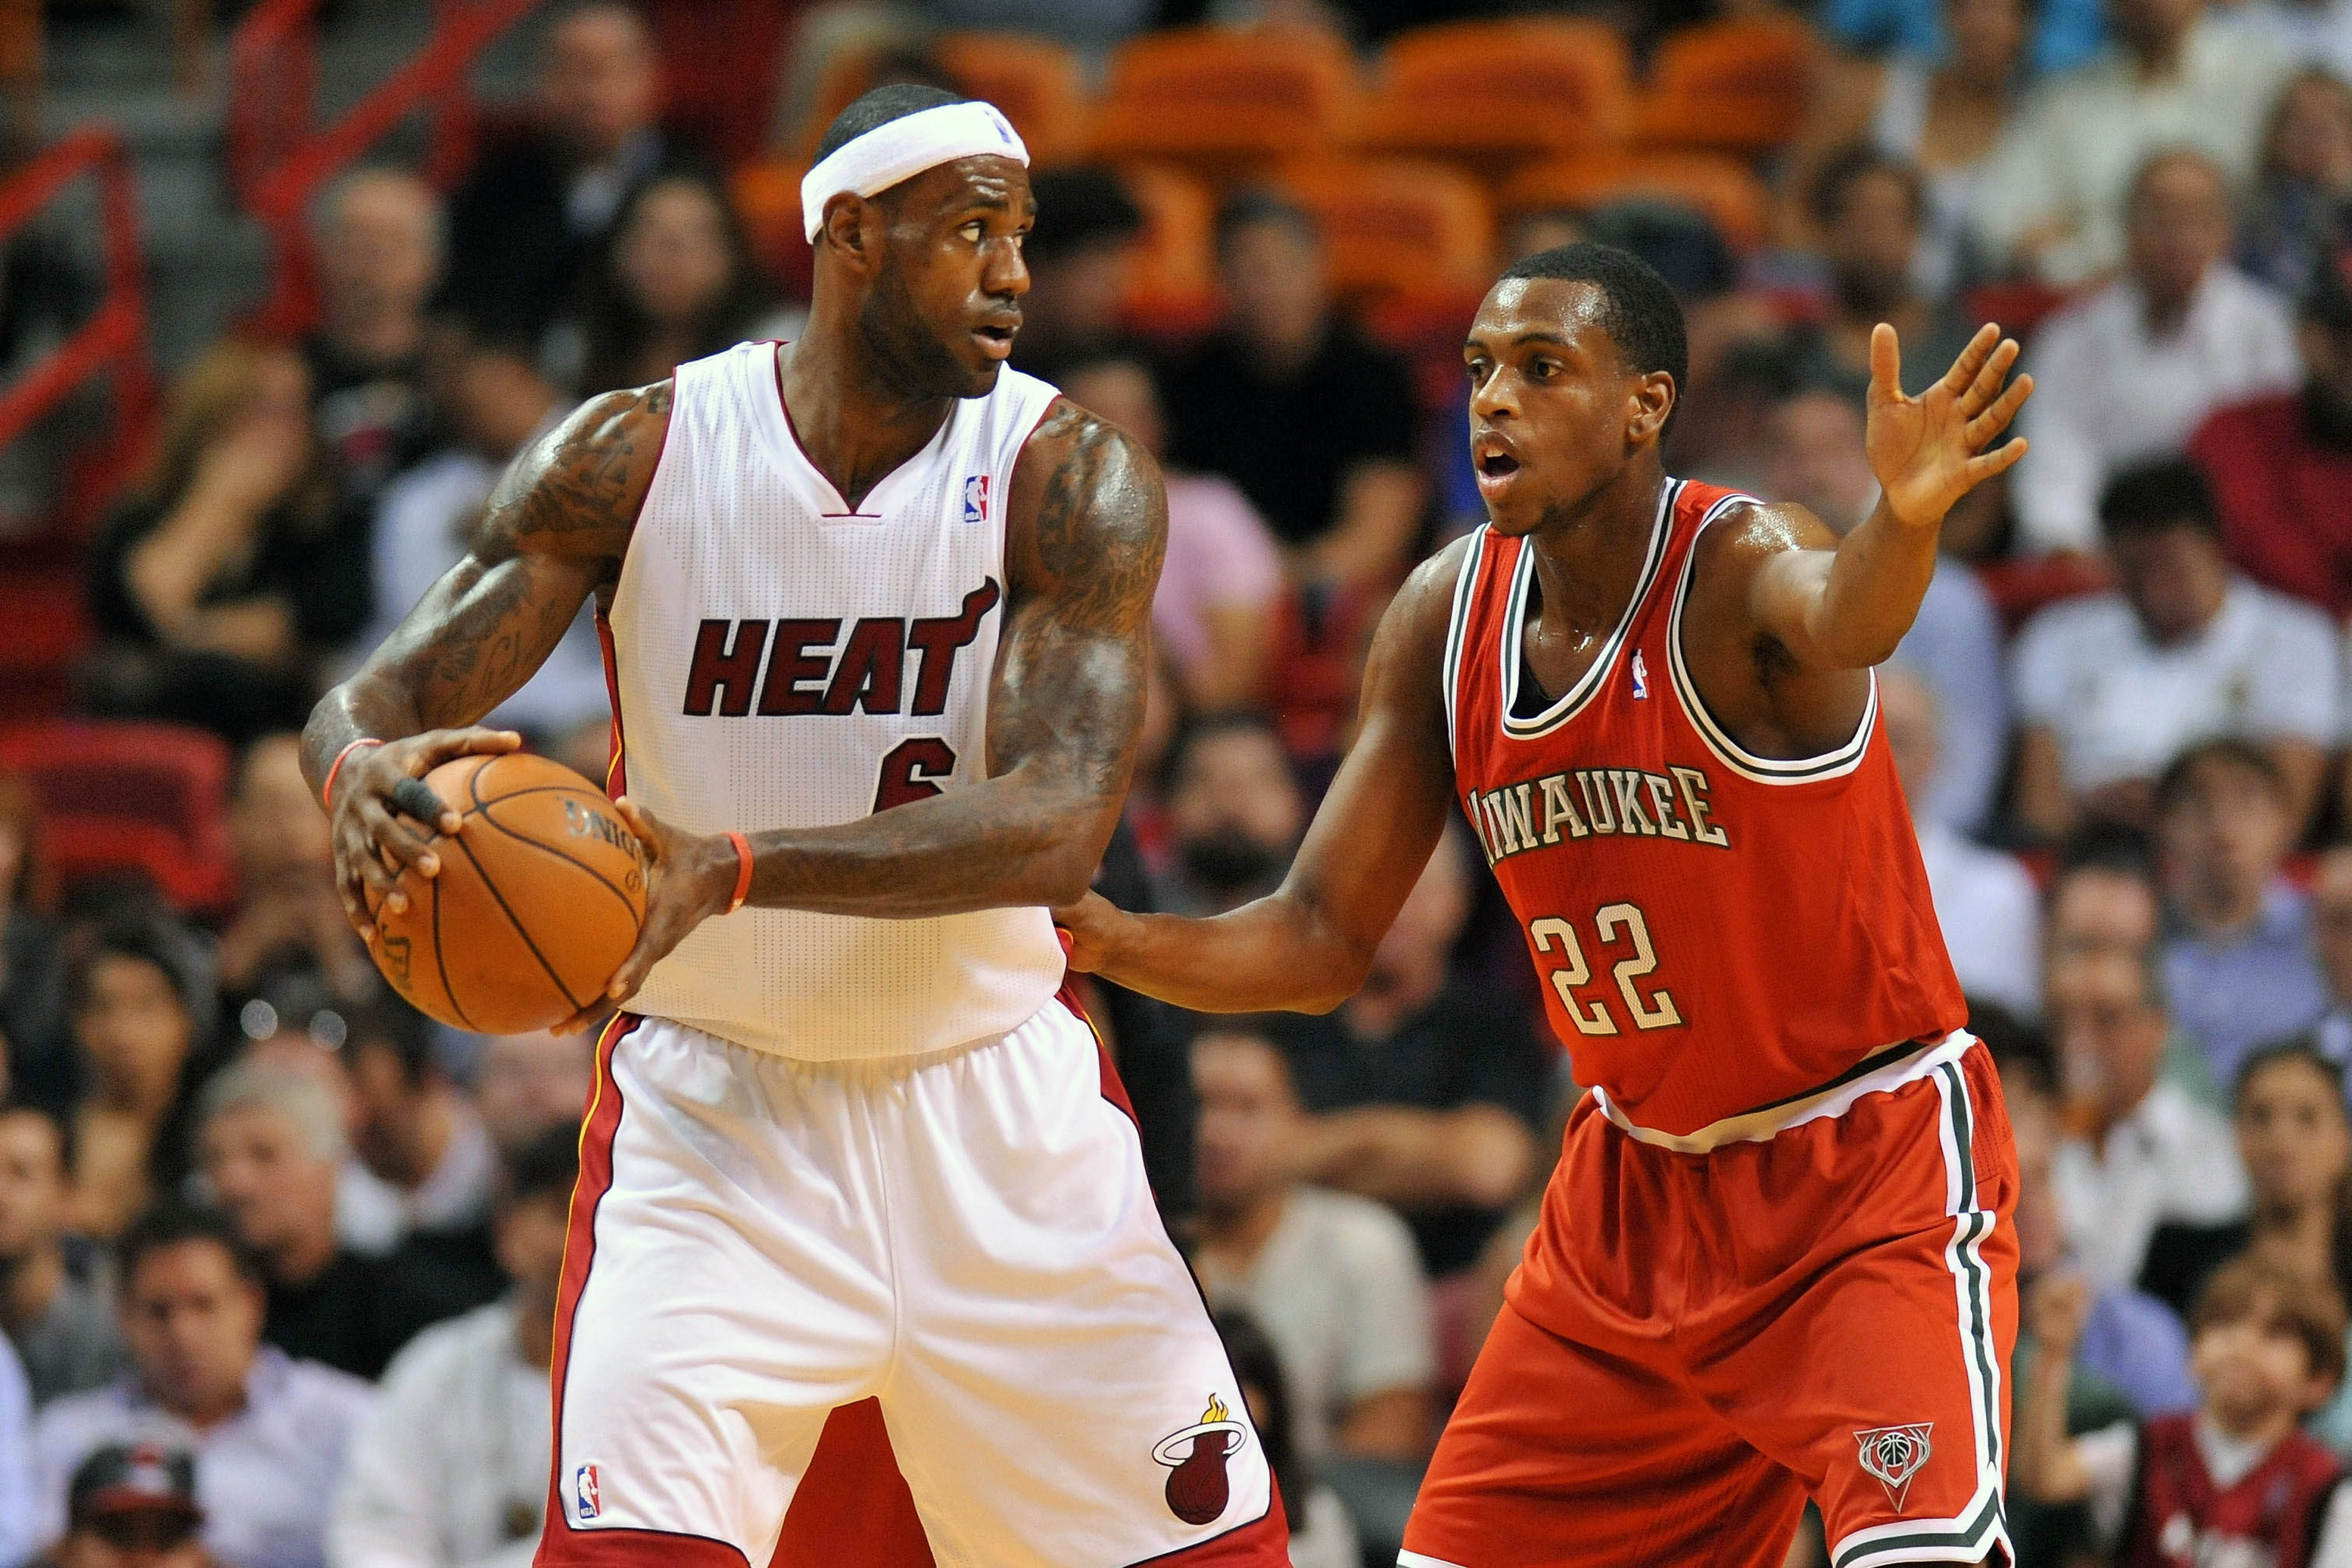 Heat vs. Bucks recap: Miami pummels Milwaukee behind LeBron James, 118-95